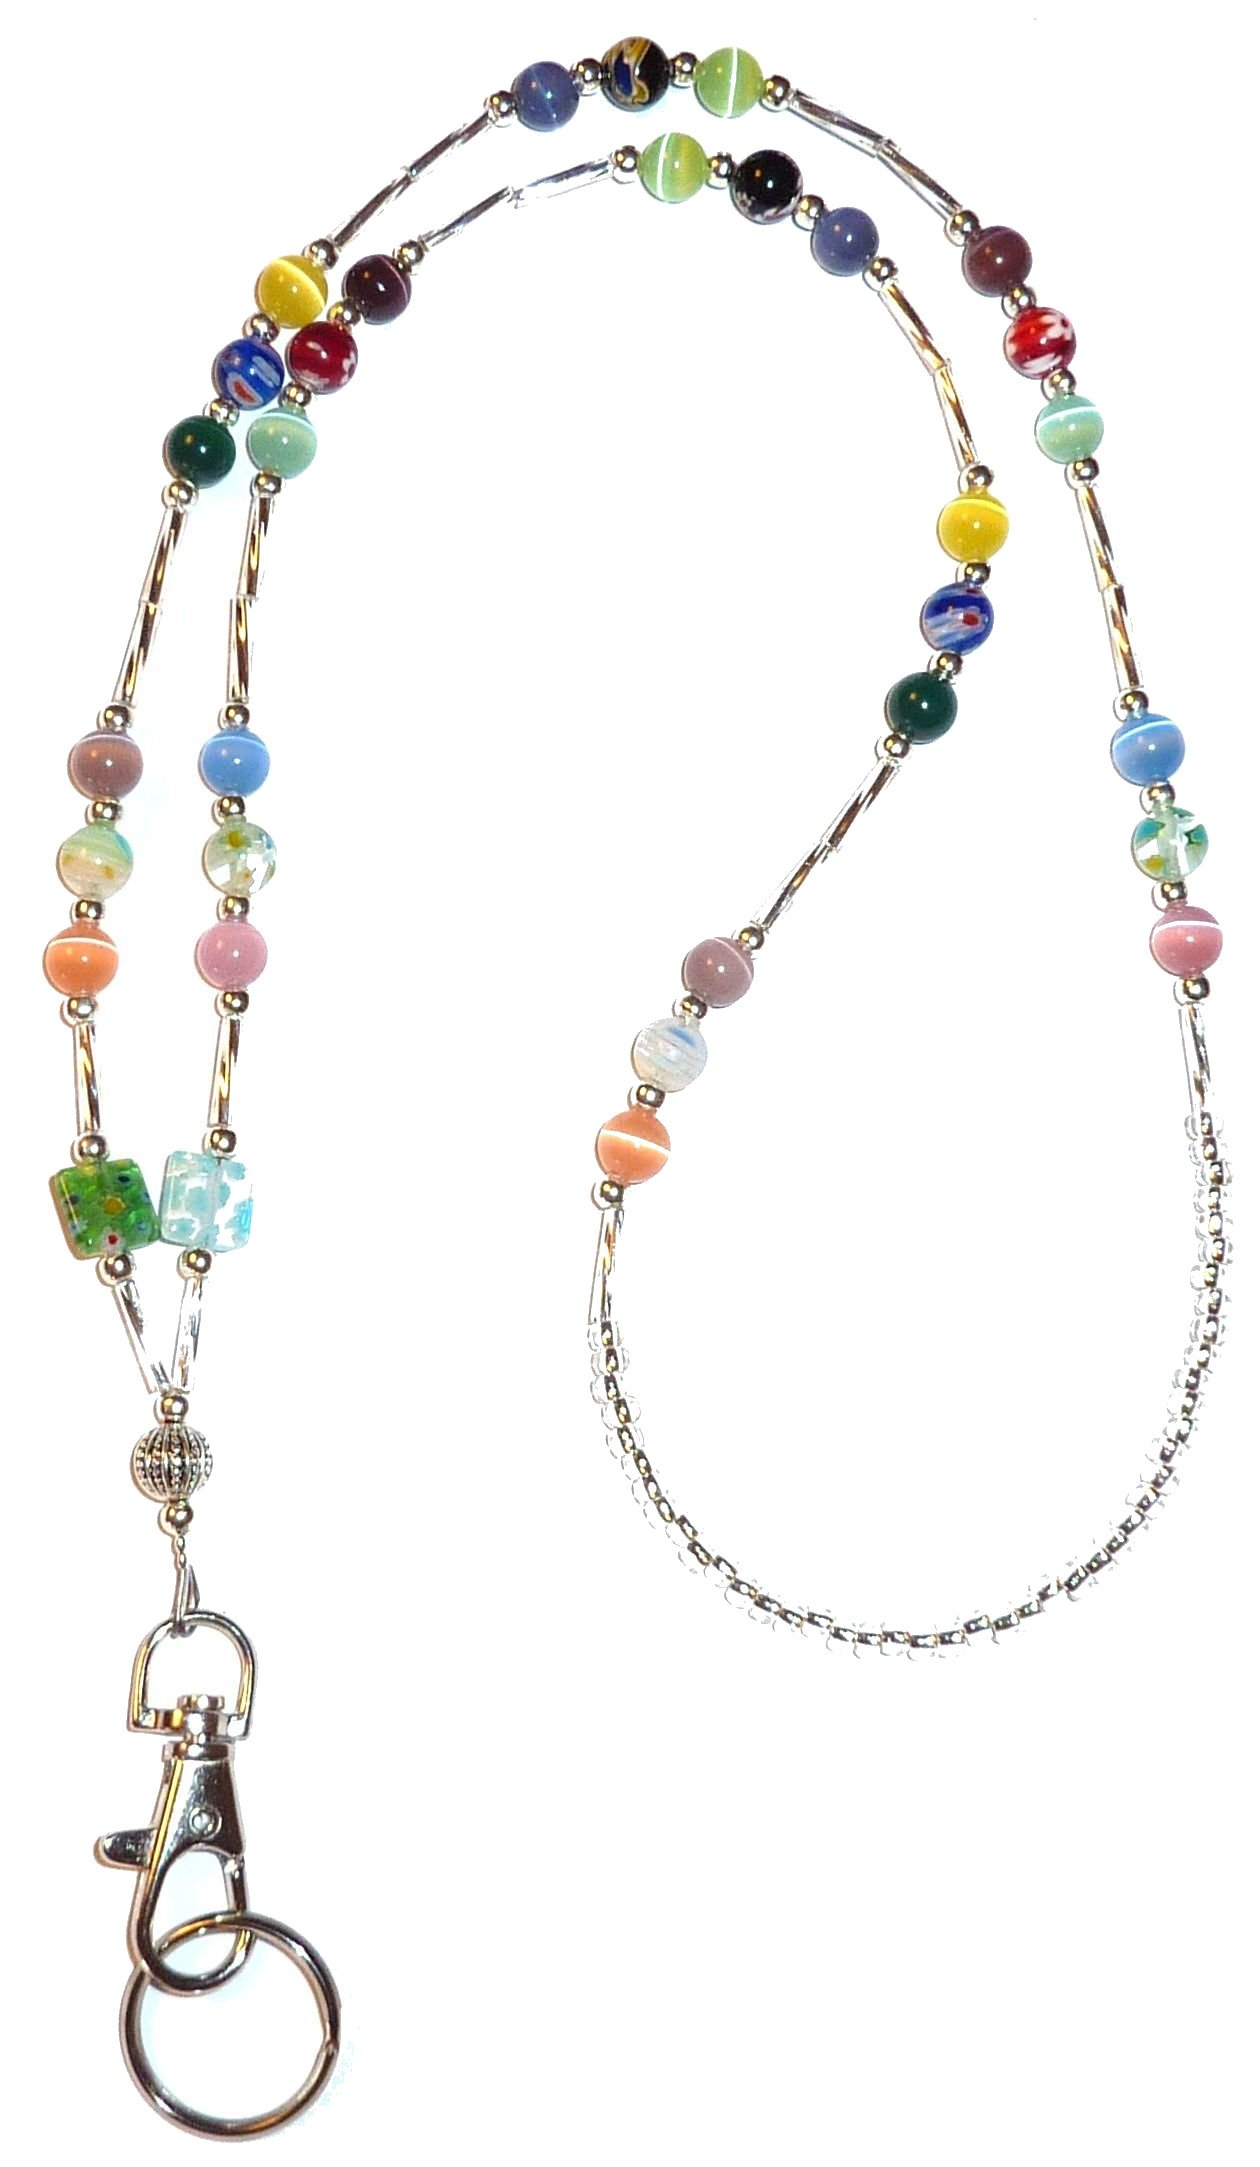 Hidden Hollow Beads Women's Beaded Lanyard 34 Inches, SUPER SLIM Multi - NON Breakaway ( Stronger)